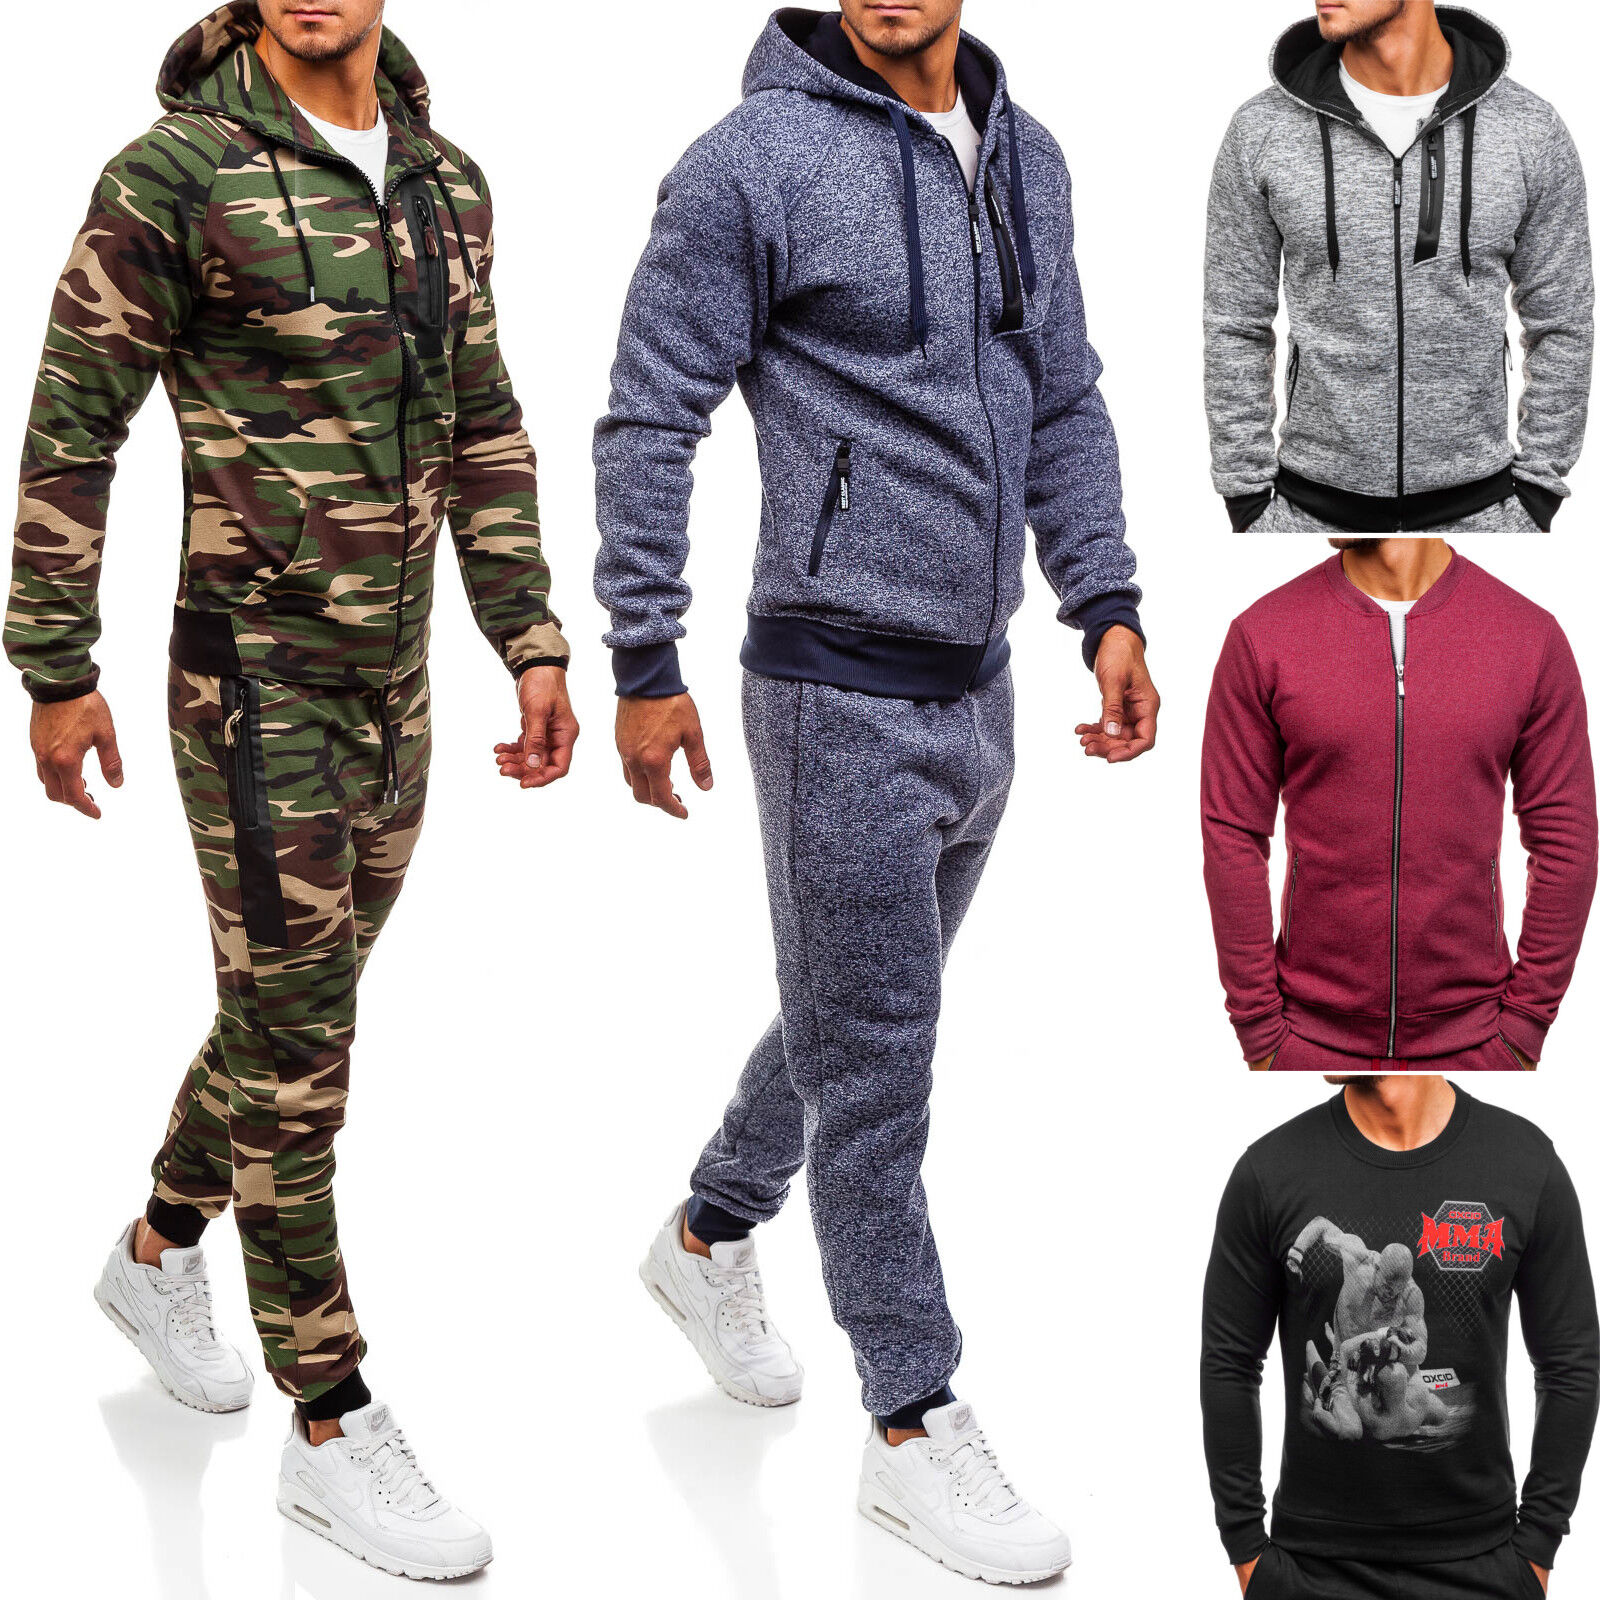 Herren Trainingsanzug Sporthose Sweatshirt Jogginganzug Sport Mix BOLF 8H8 Camo